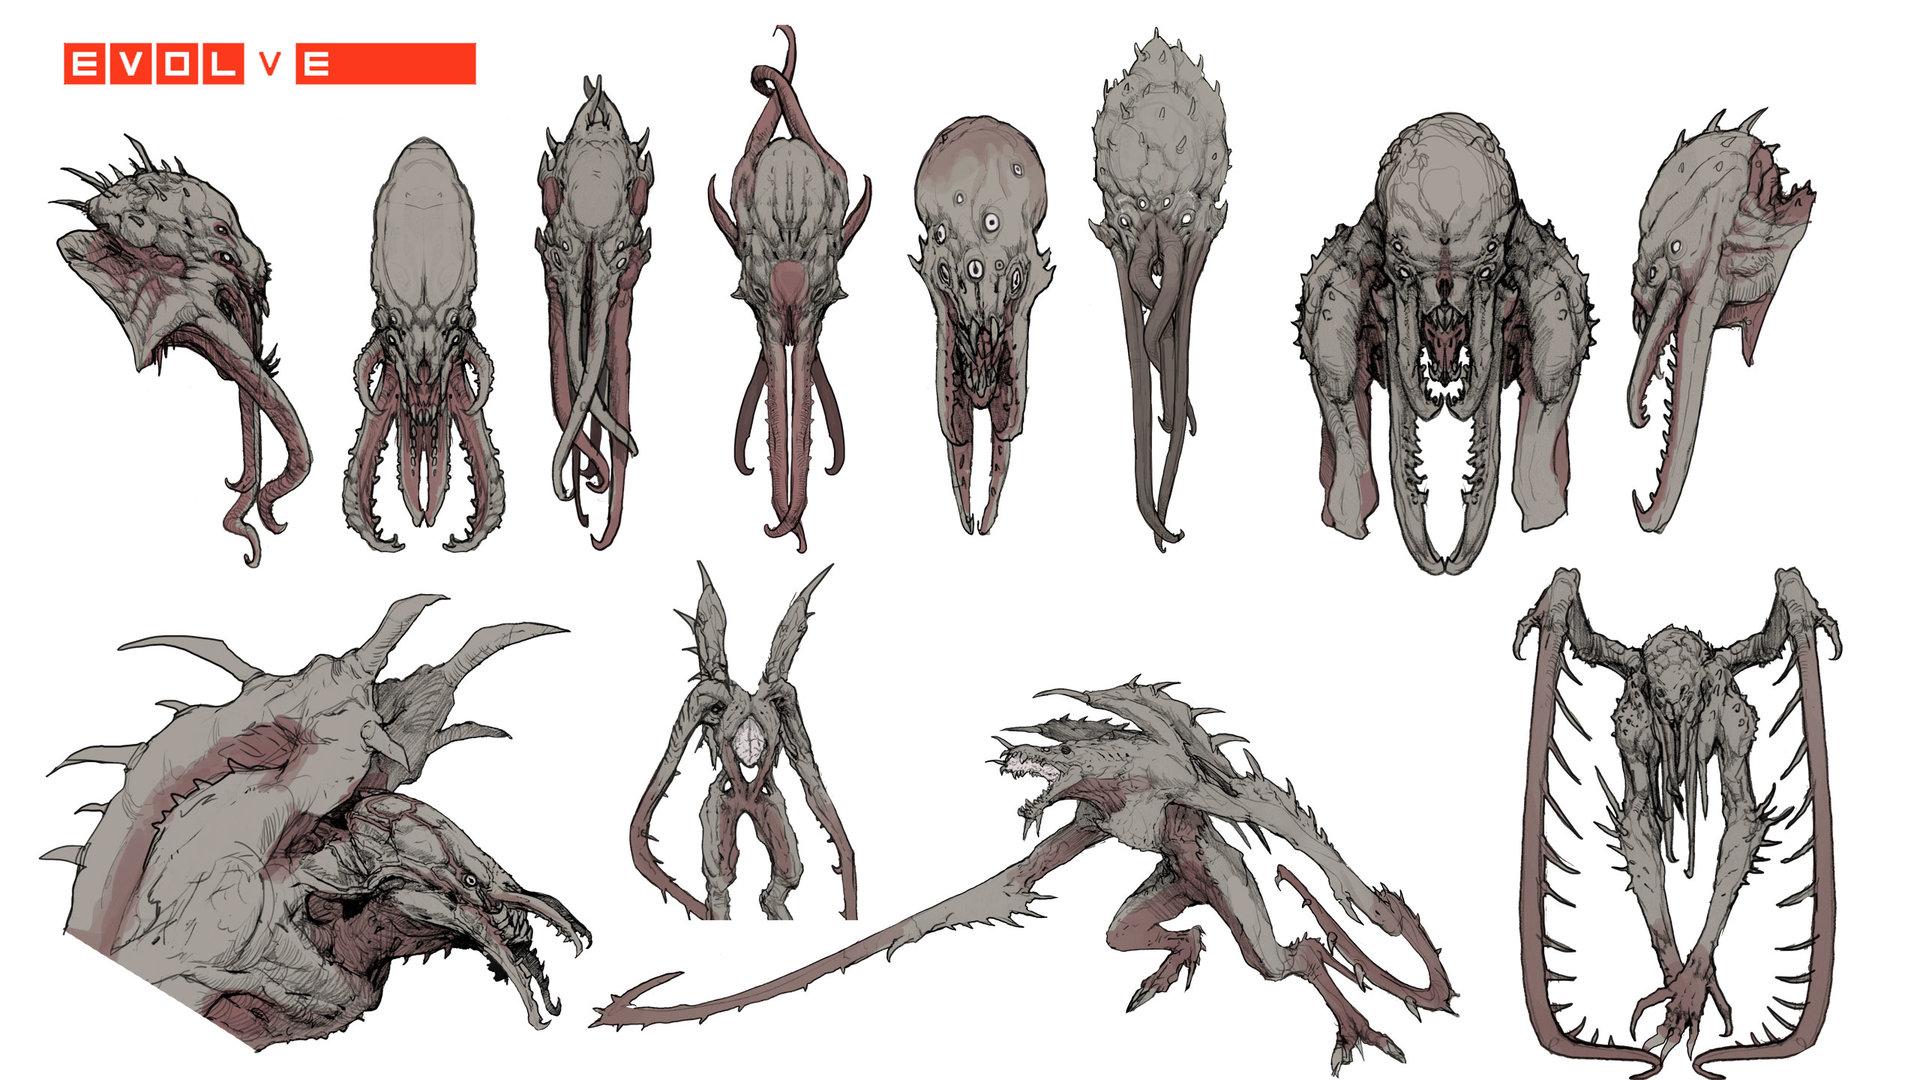 Evolve concept art picture kraken варианты монстра